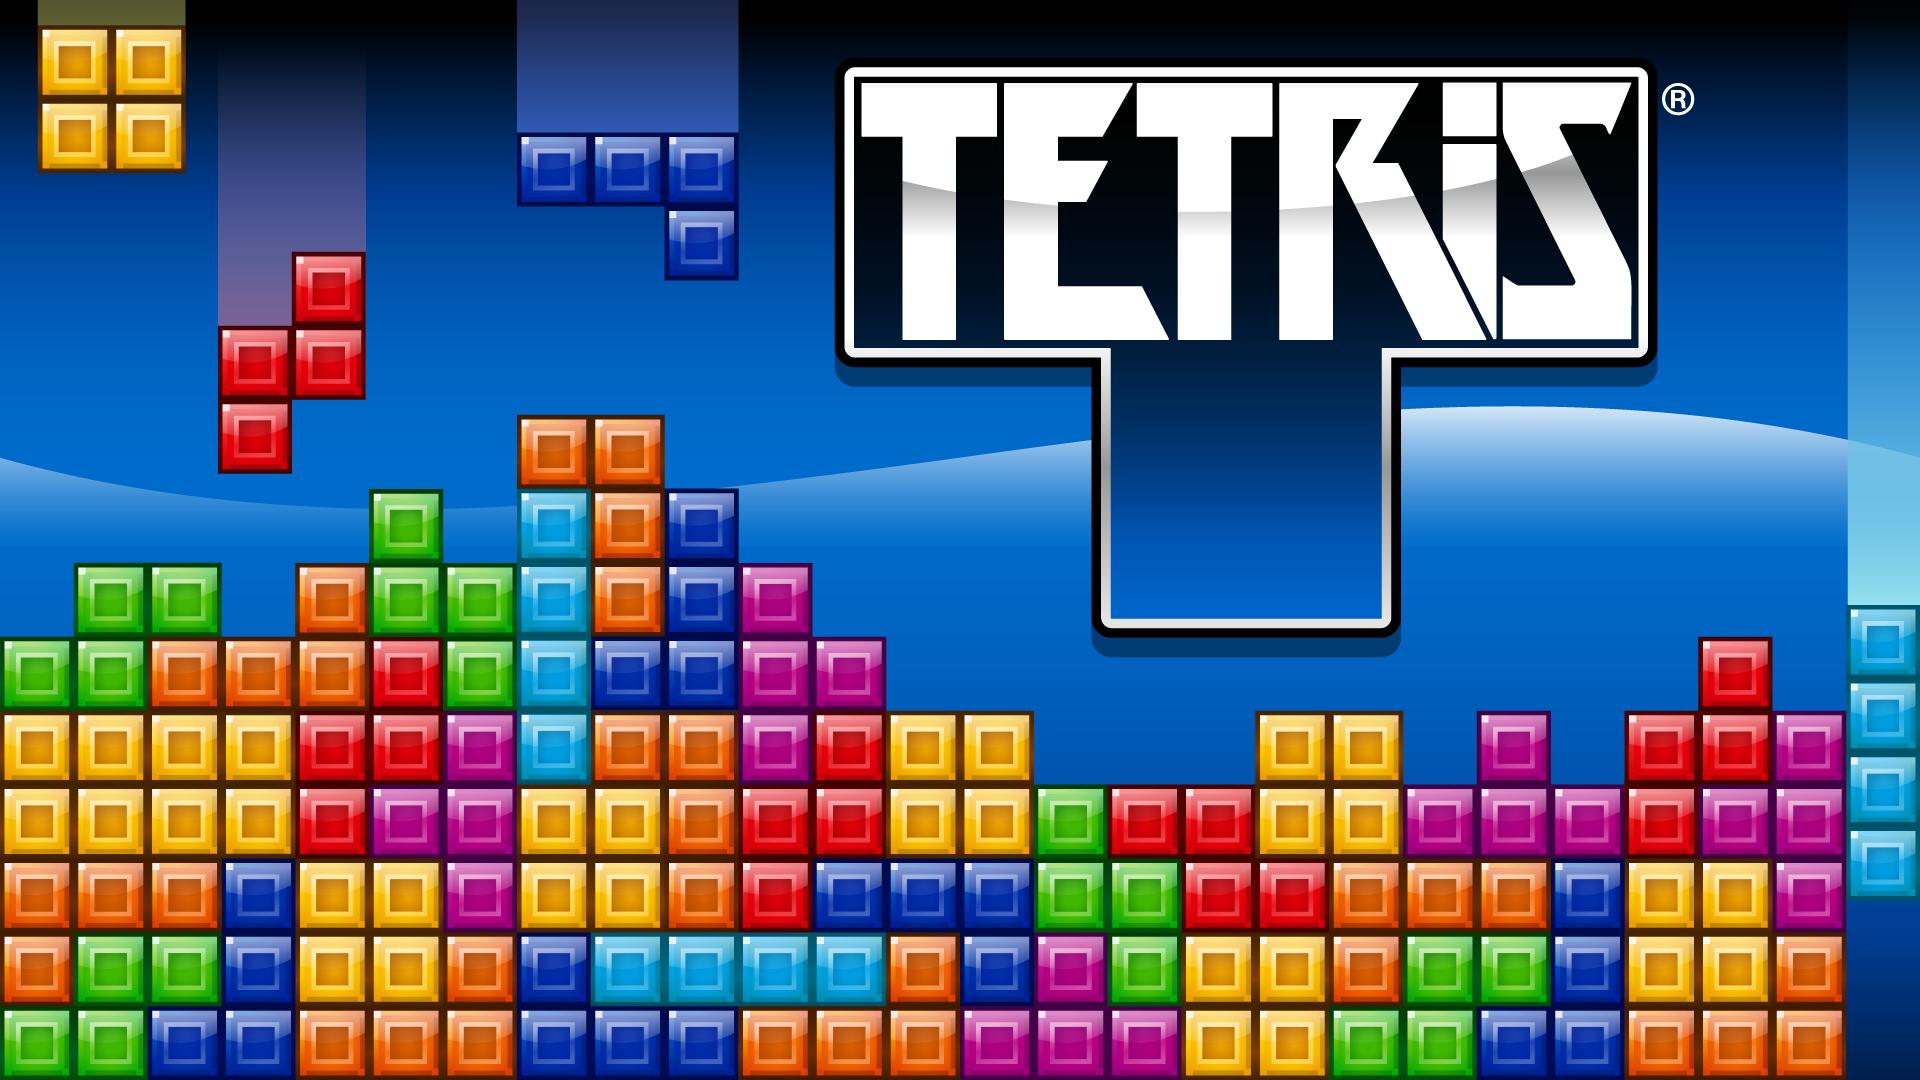 Tetris - 13